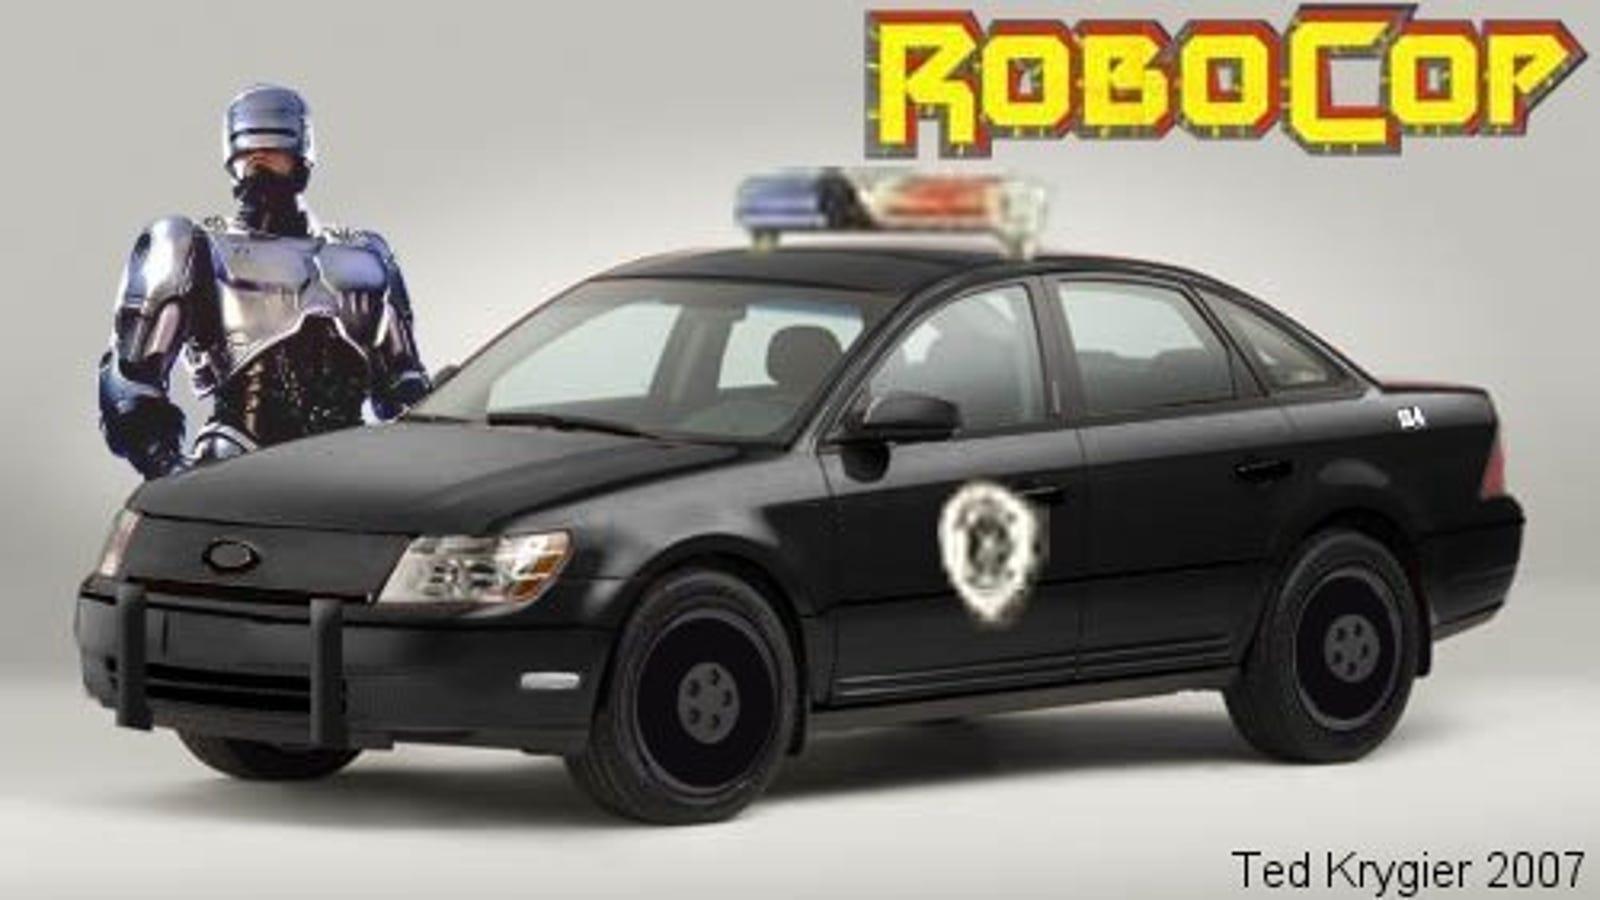 2008 Ford Taurus Robocop Edition